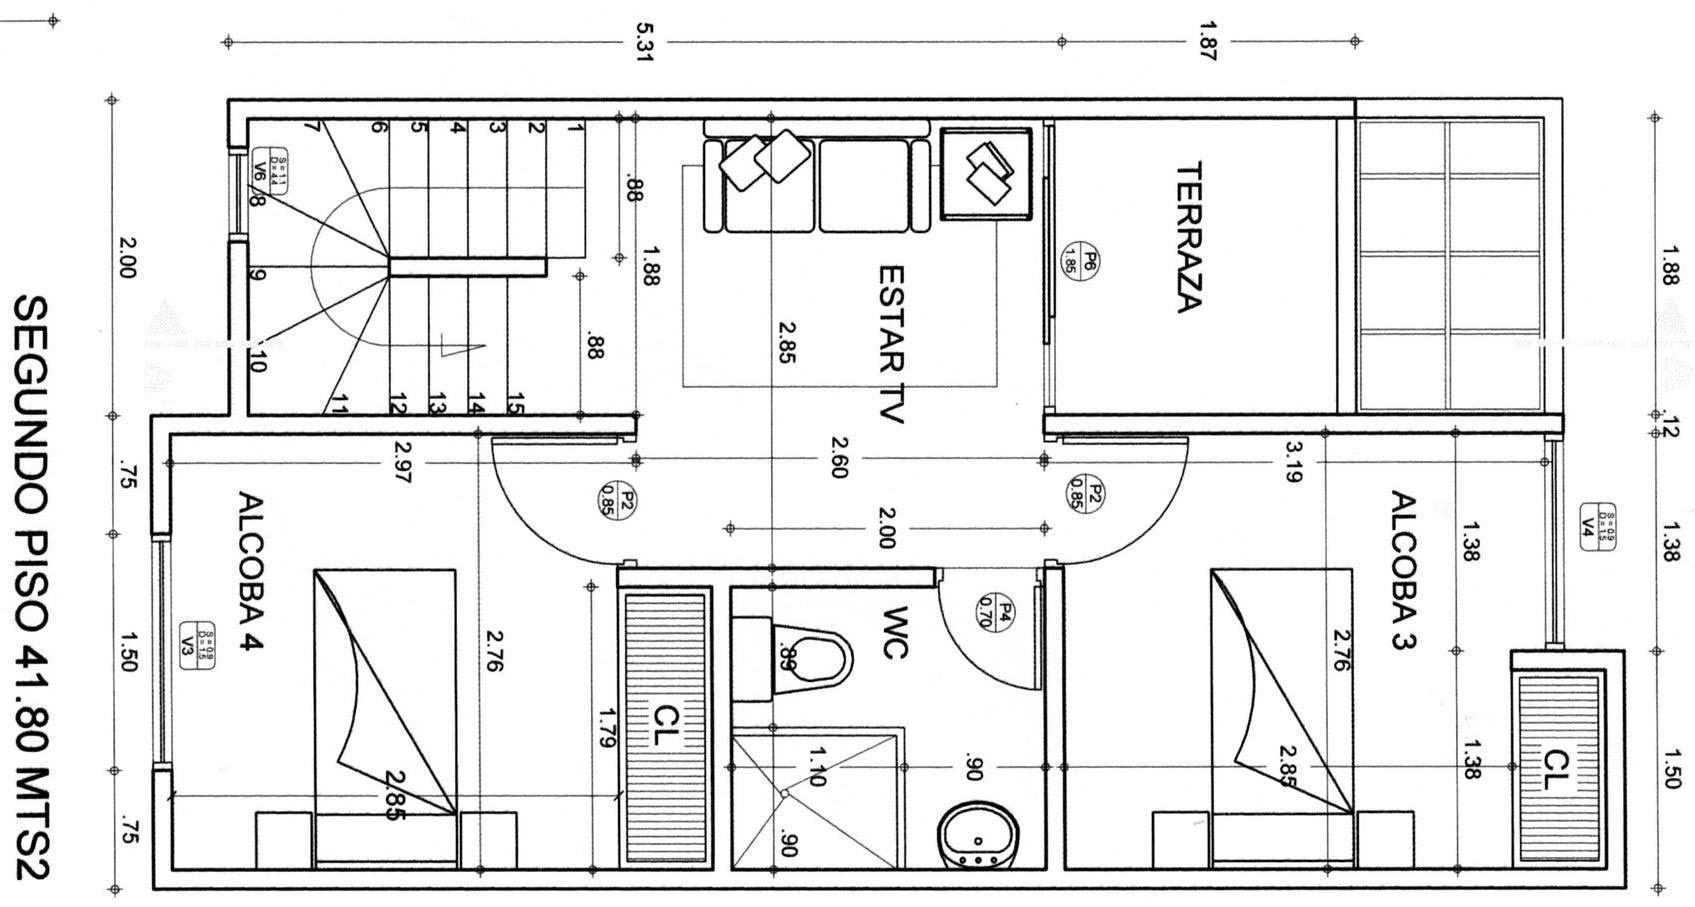 Planos arquitectonicos gratis buscar con google planos for Planos tecnicos arquitectonicos